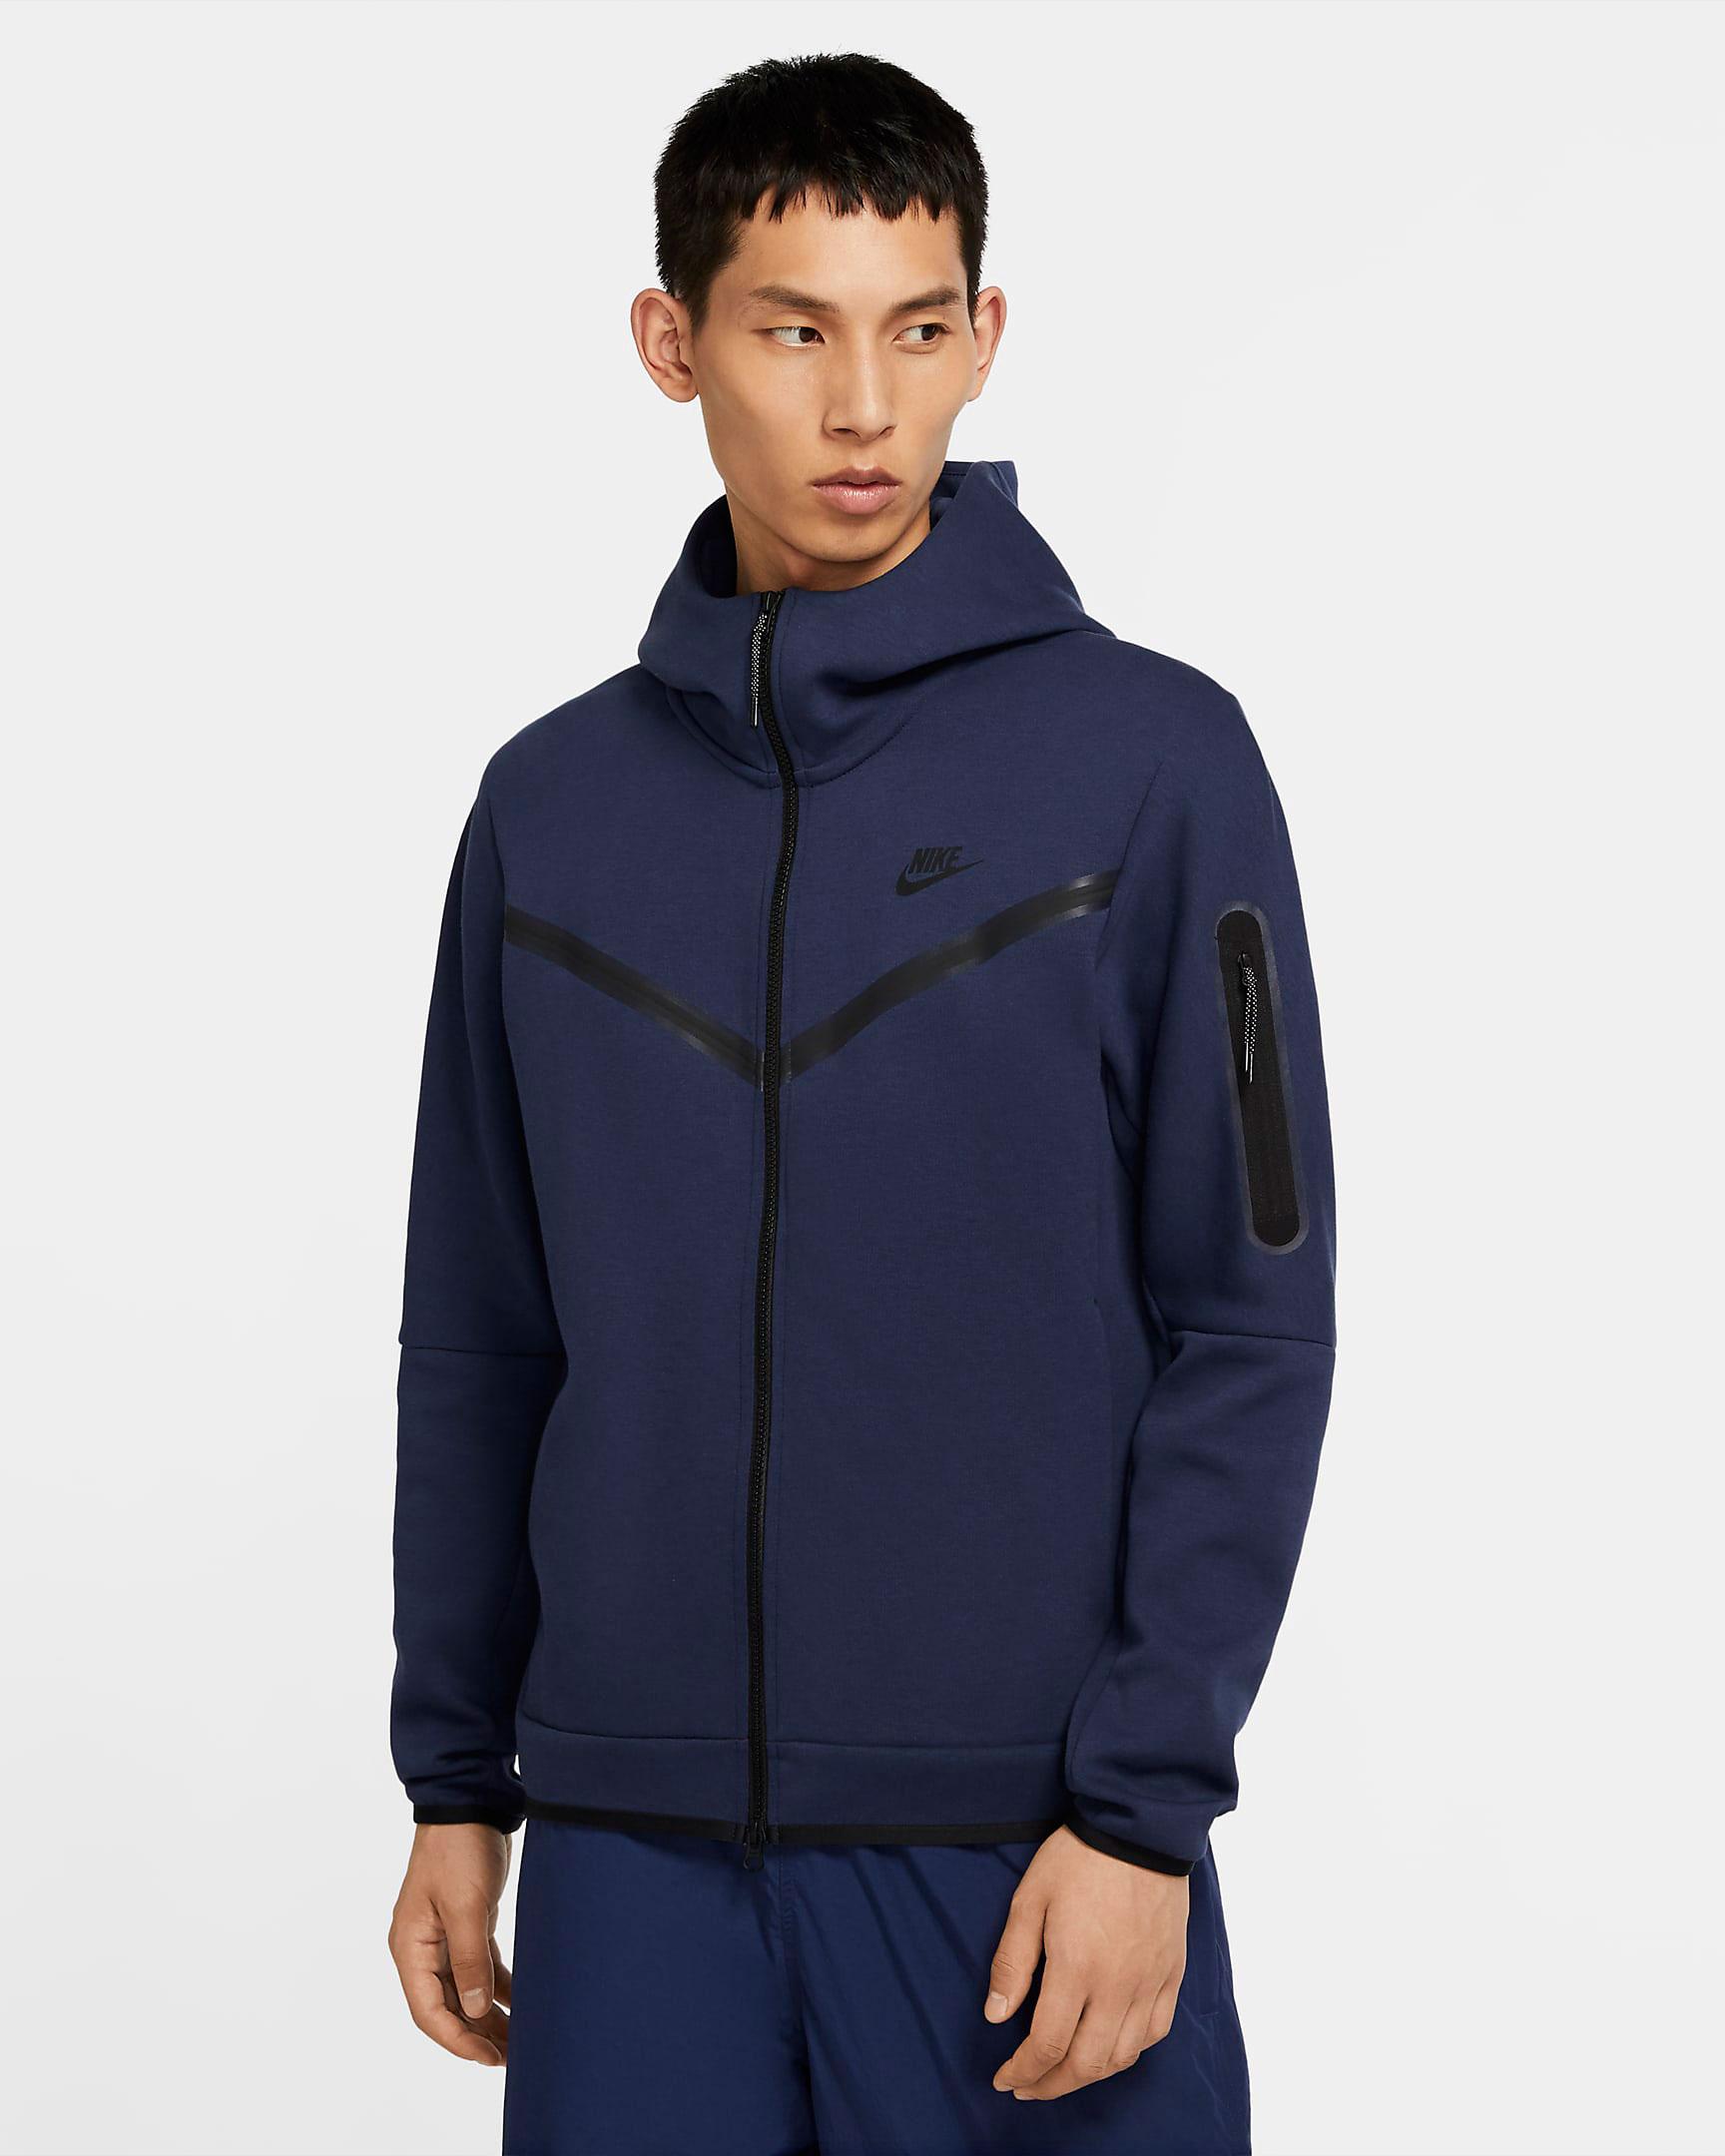 jordan-1-high-midnight-navy-nike-tech-fleece-hoodie